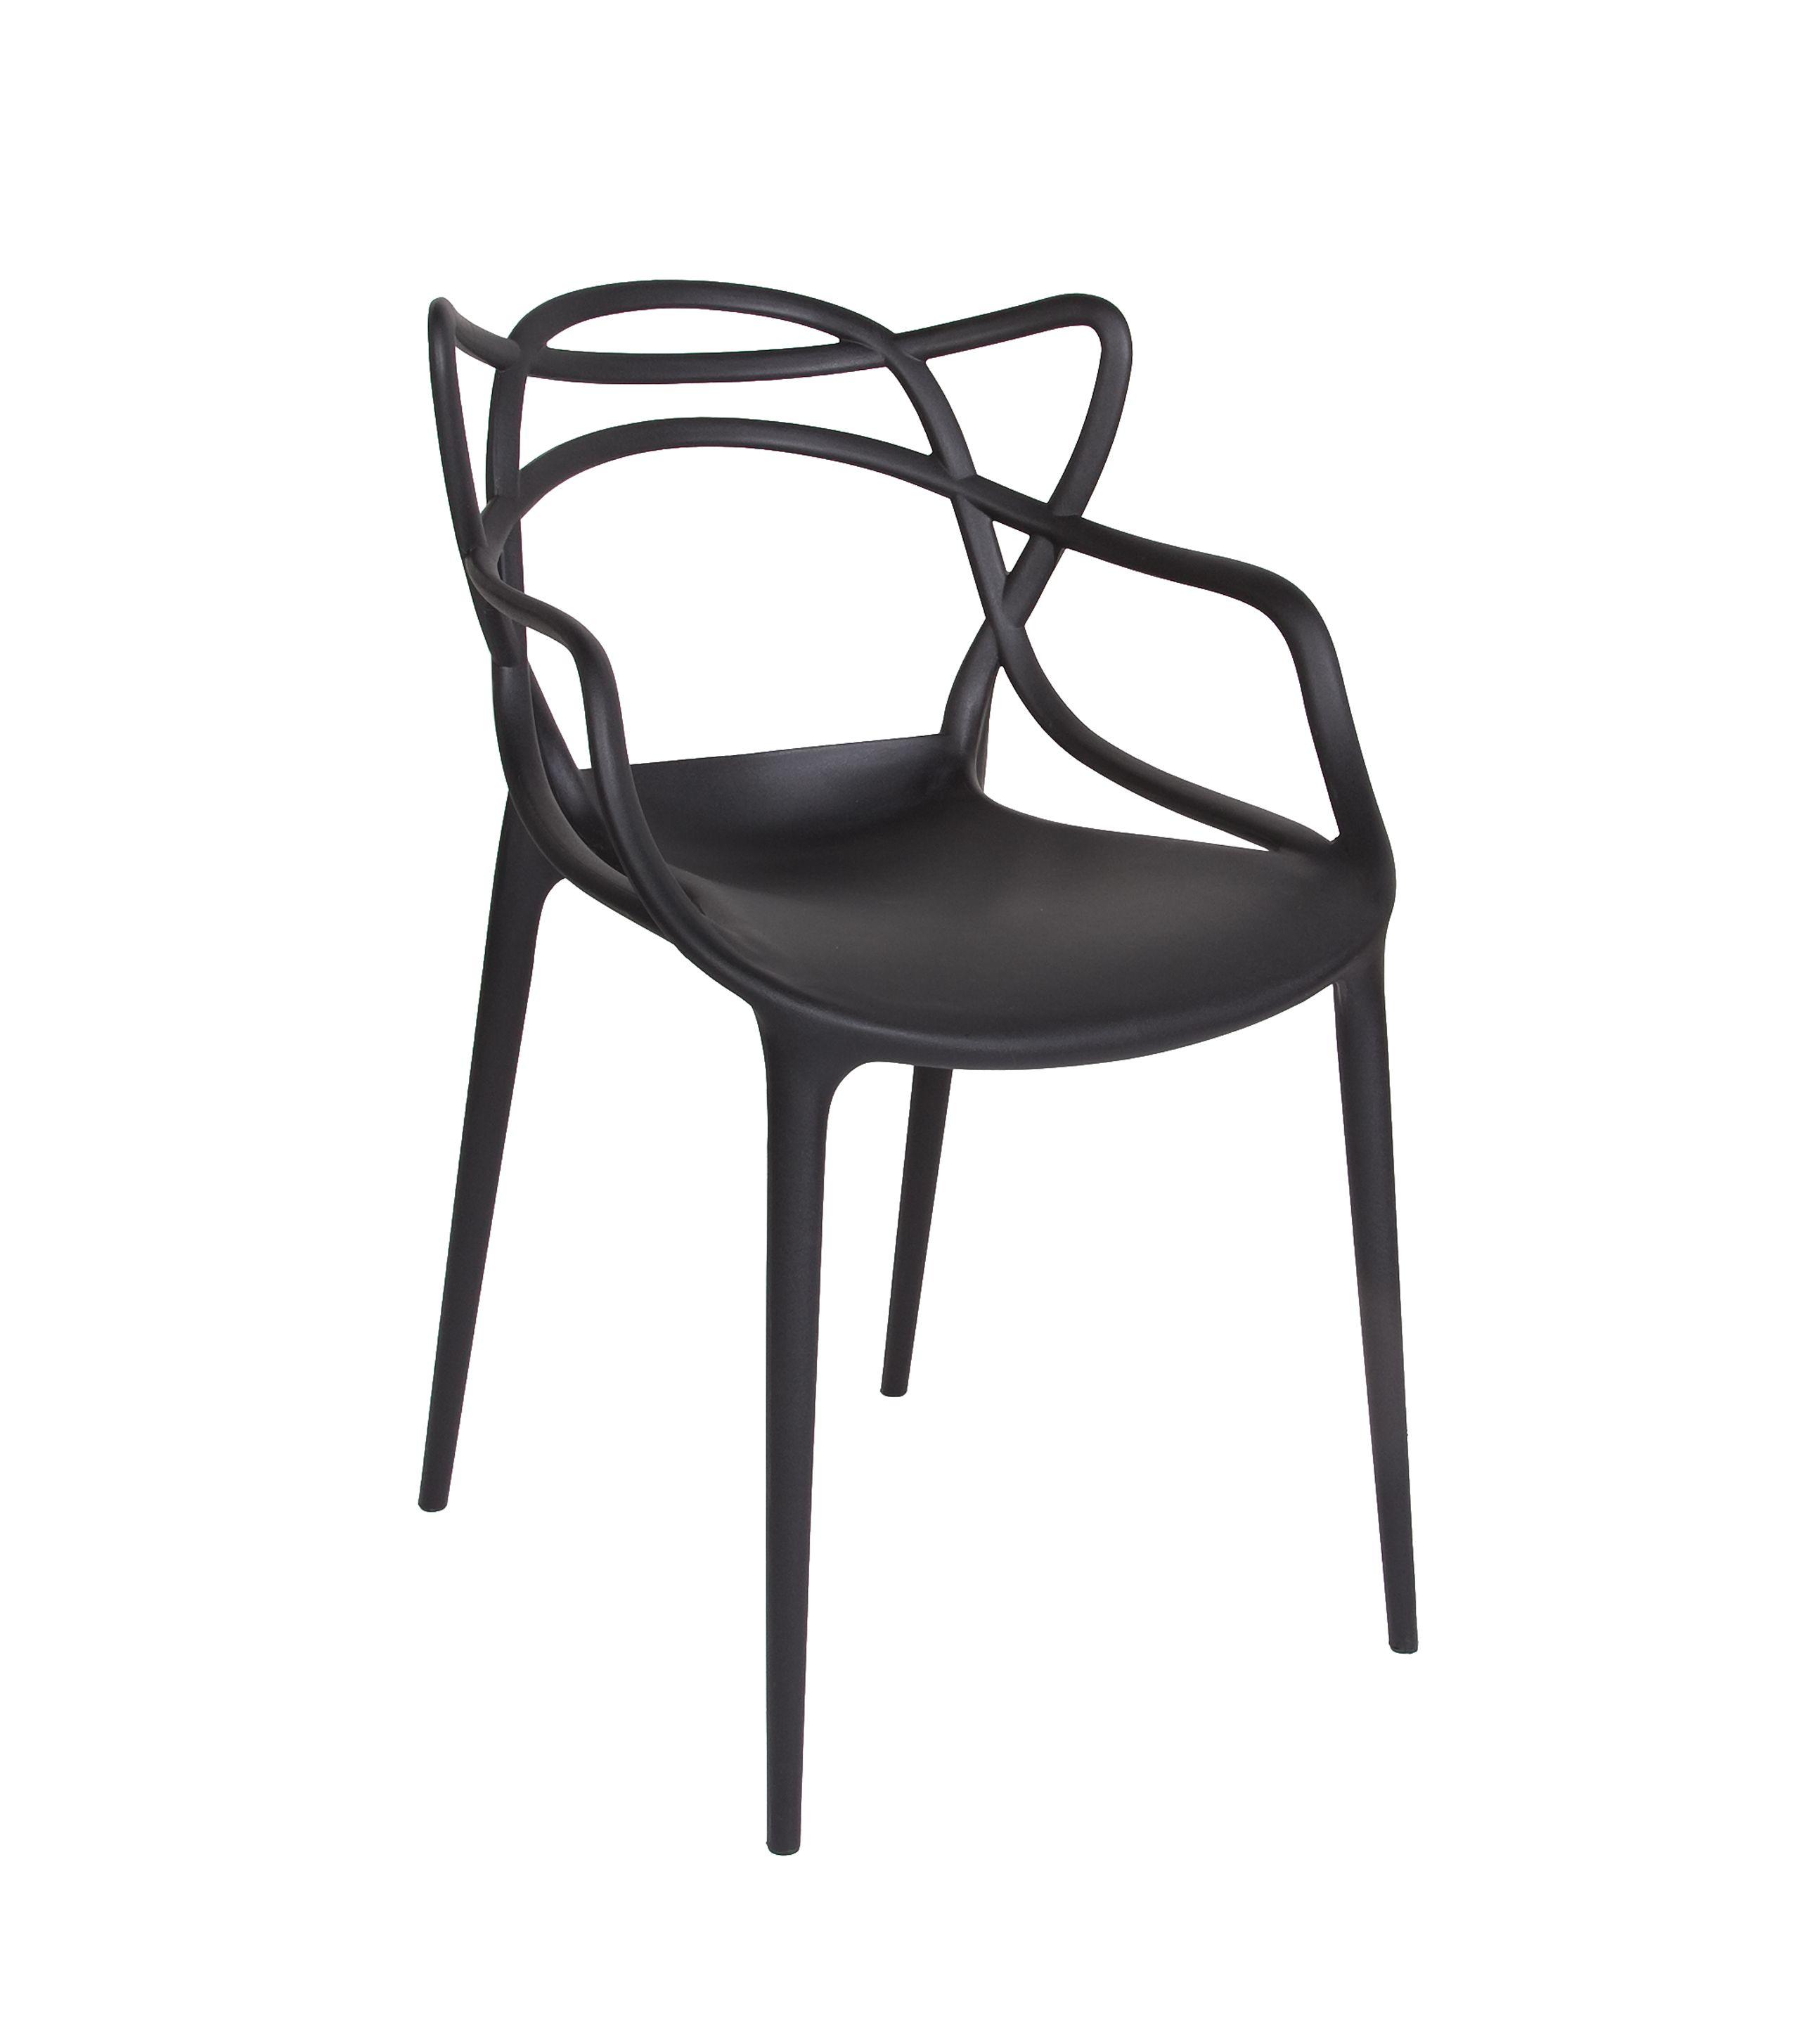 Crane Chair Matte Black Masters Chair Kartell Masters Chair Philippe Starck